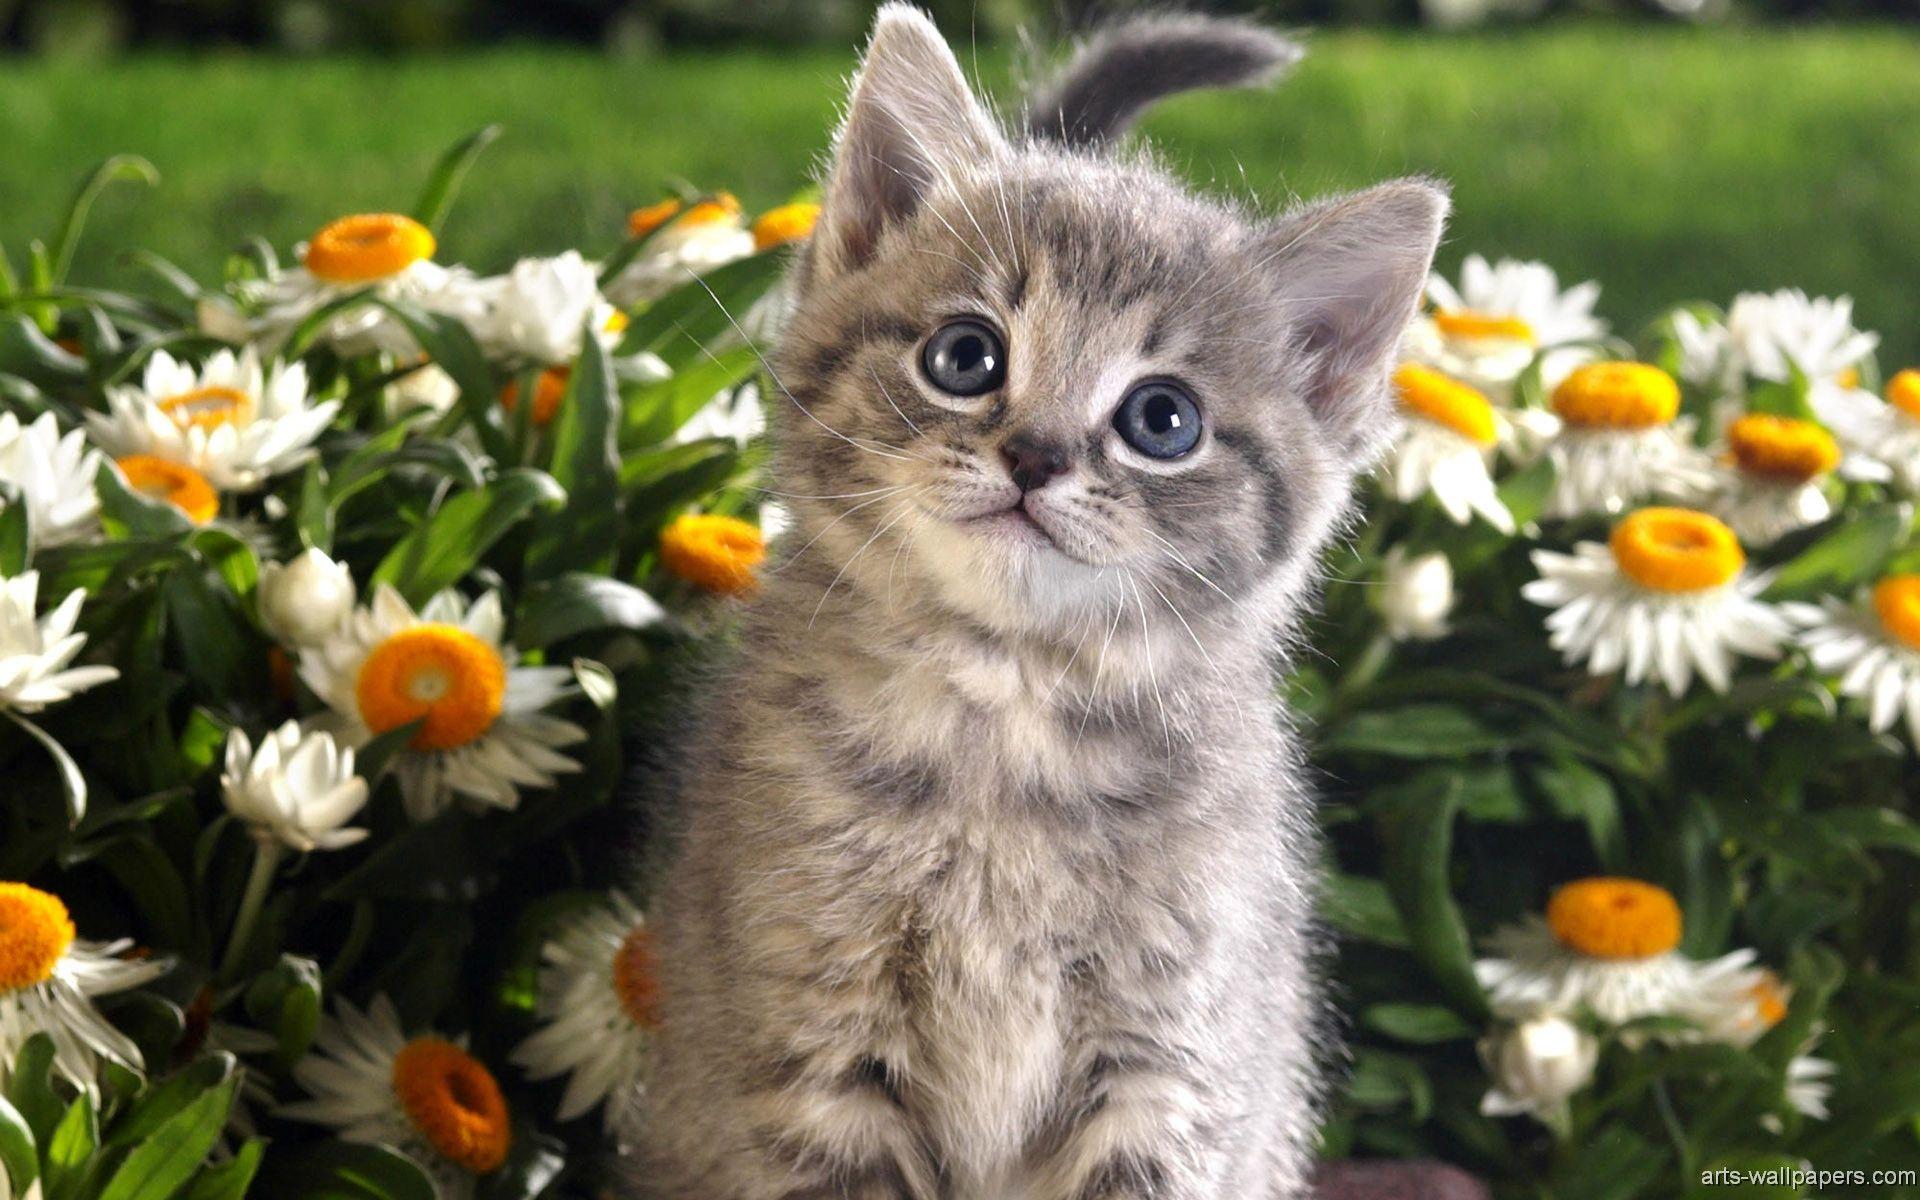 Kitten Wallpapers Kittens Cutest Kitten Wallpaper Spring Animals